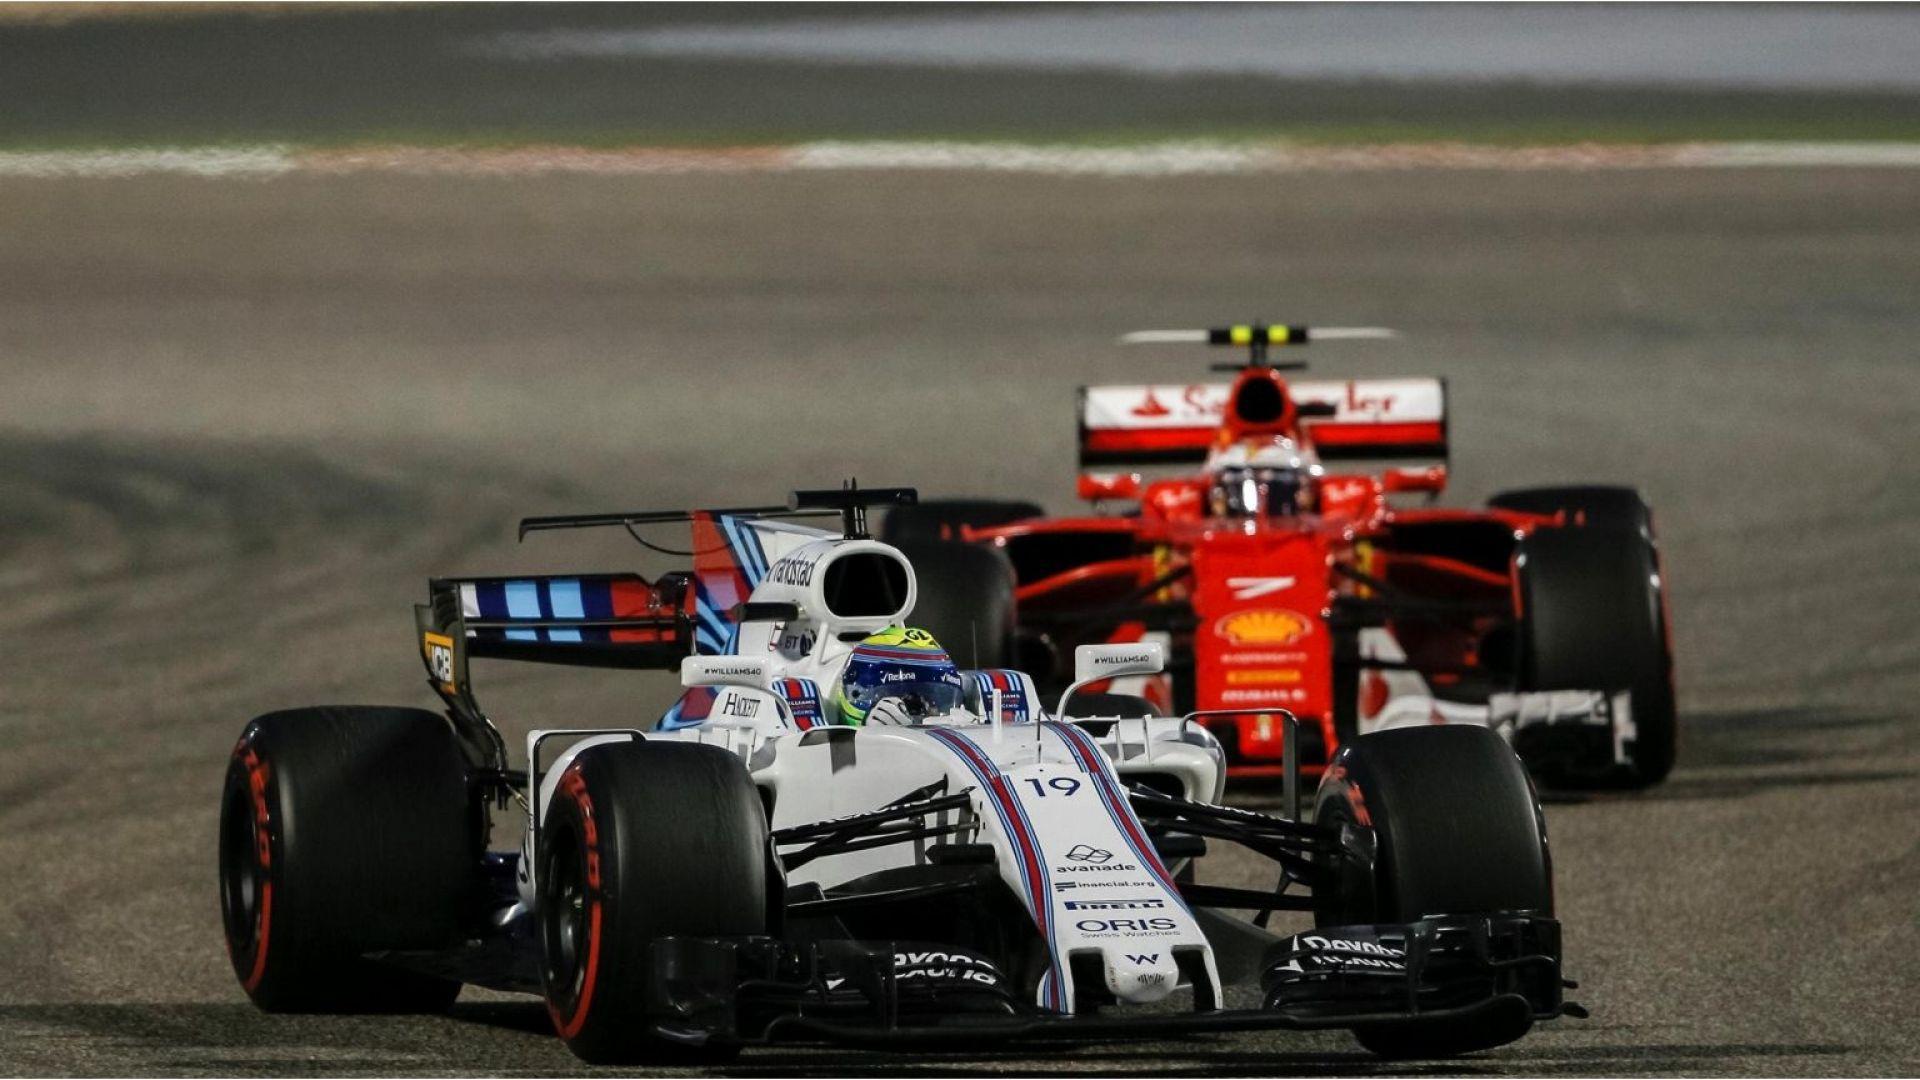 F1 2017: F1, GP Bahrain 2017: le pagelle del circuito Sakhir di Manama - MotorBox